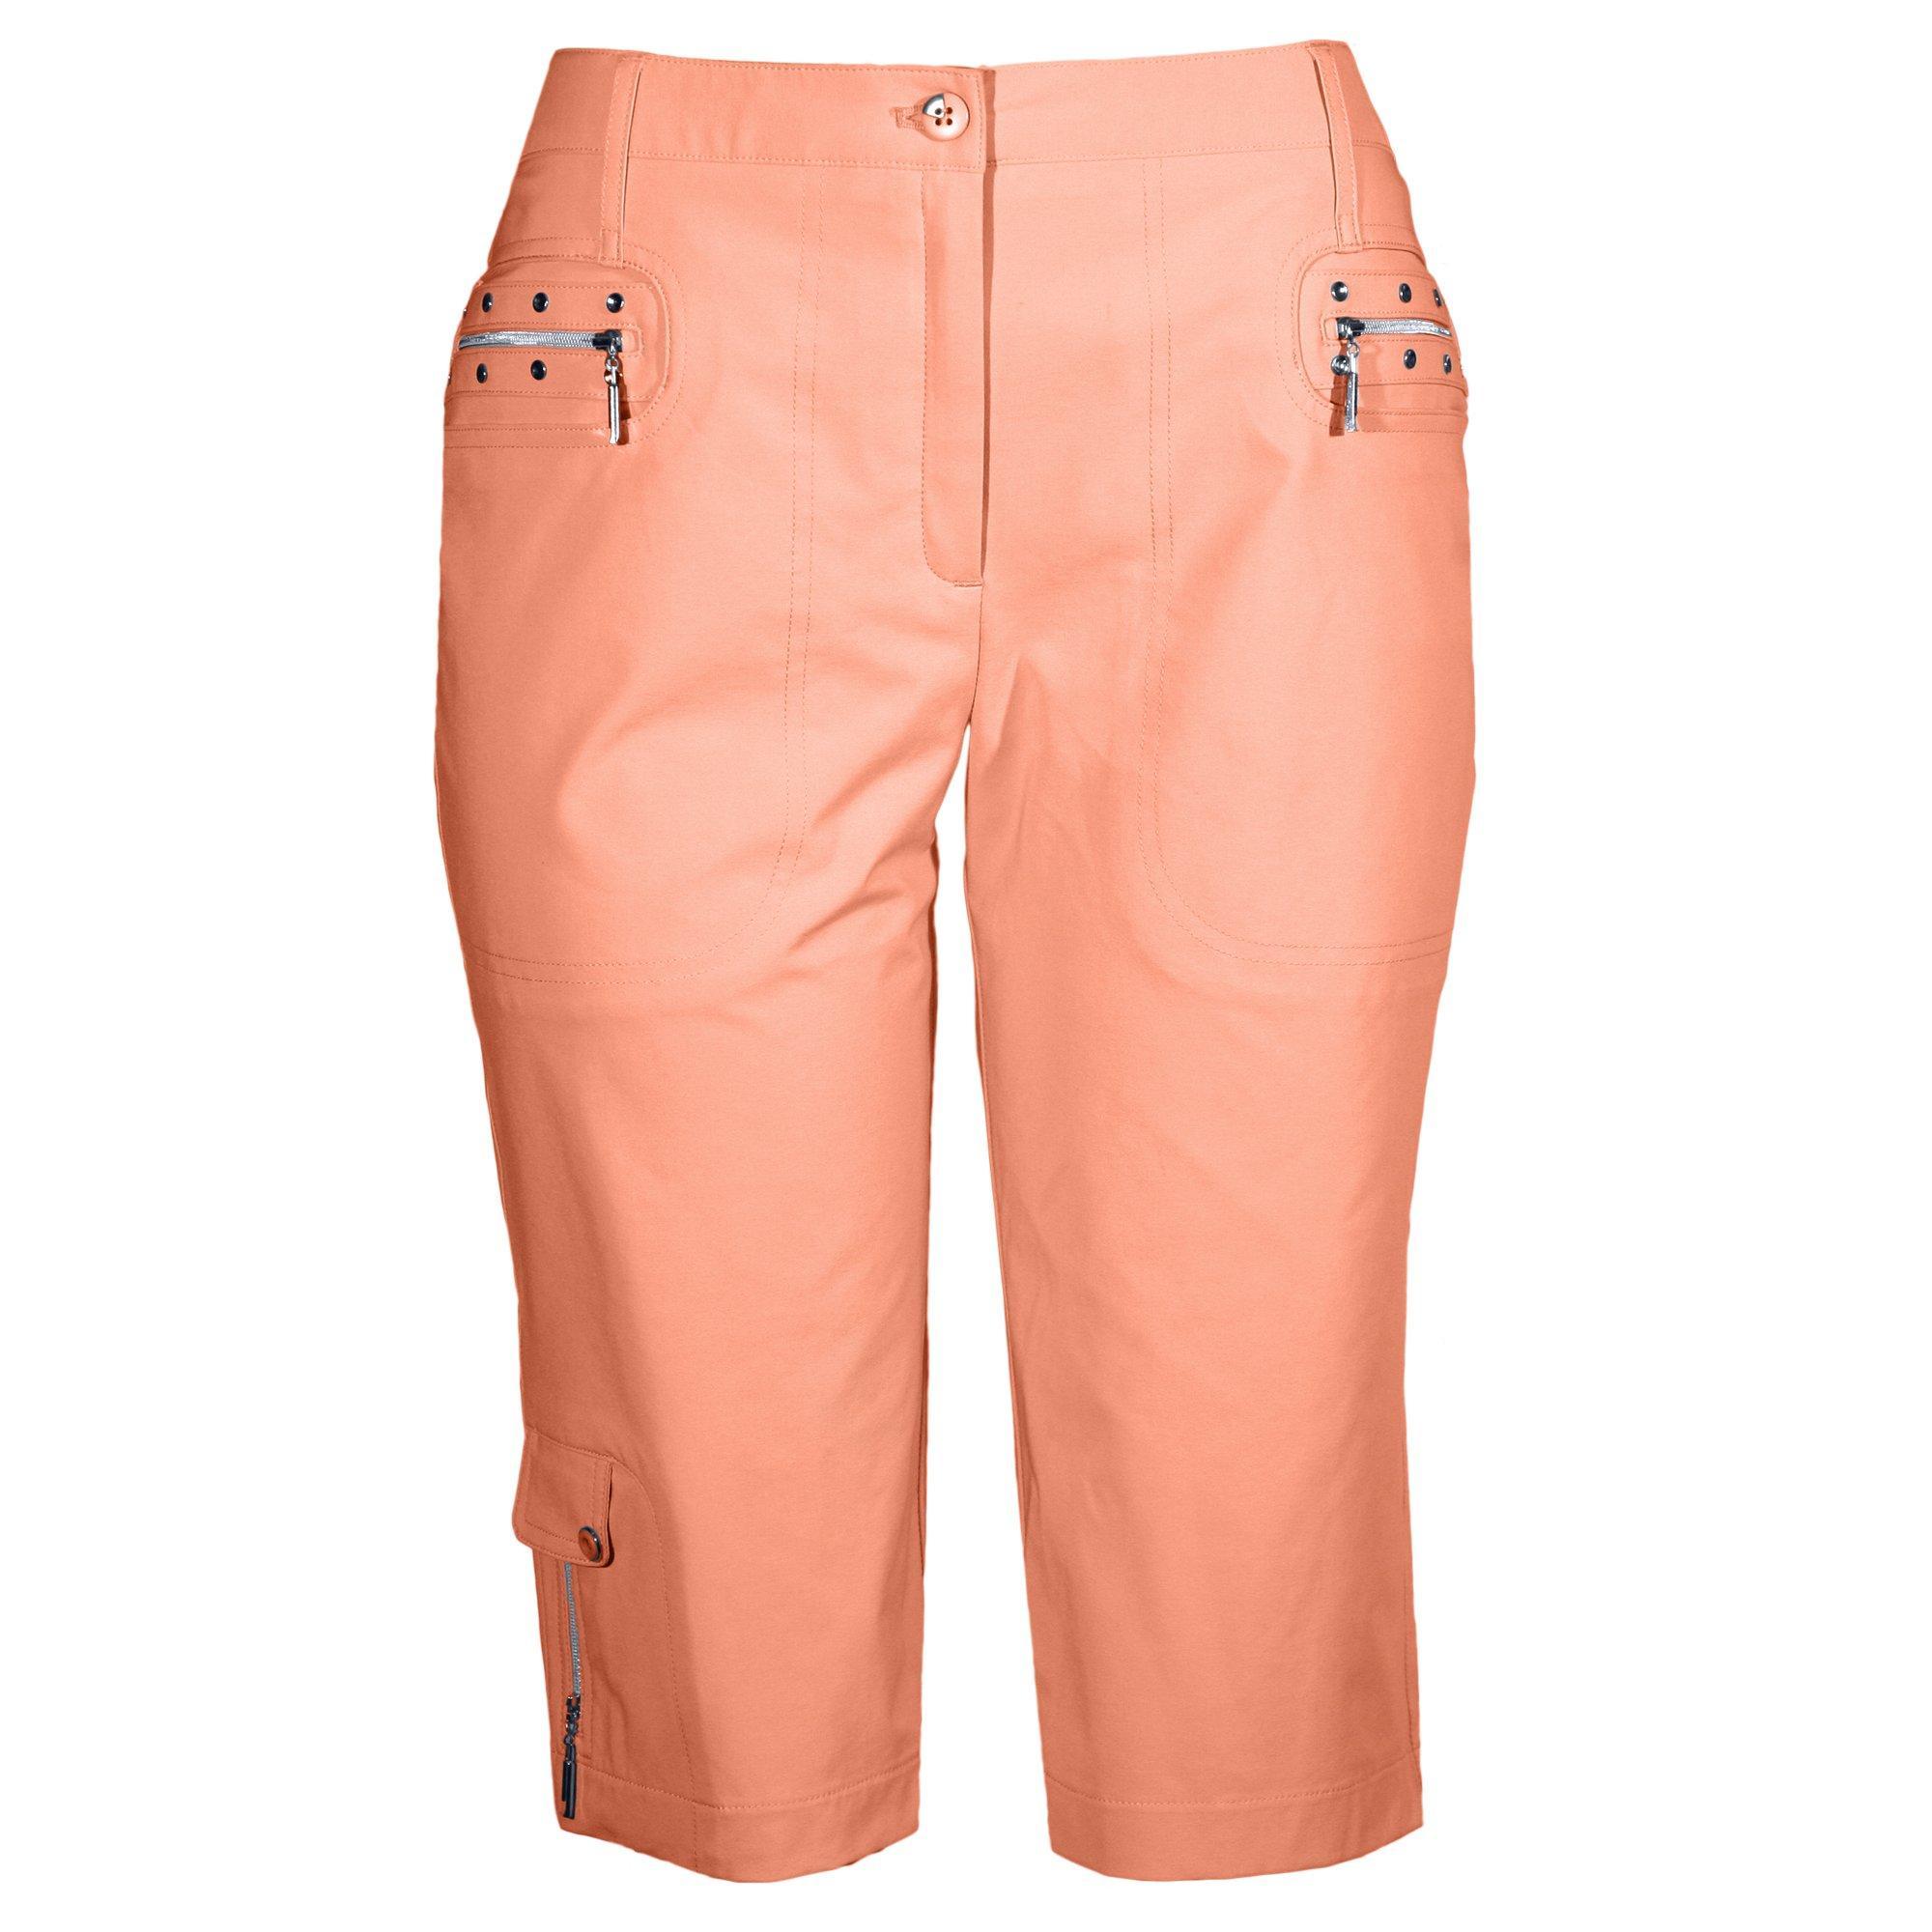 Women's Airwear 24.5 Inch Knee Capri